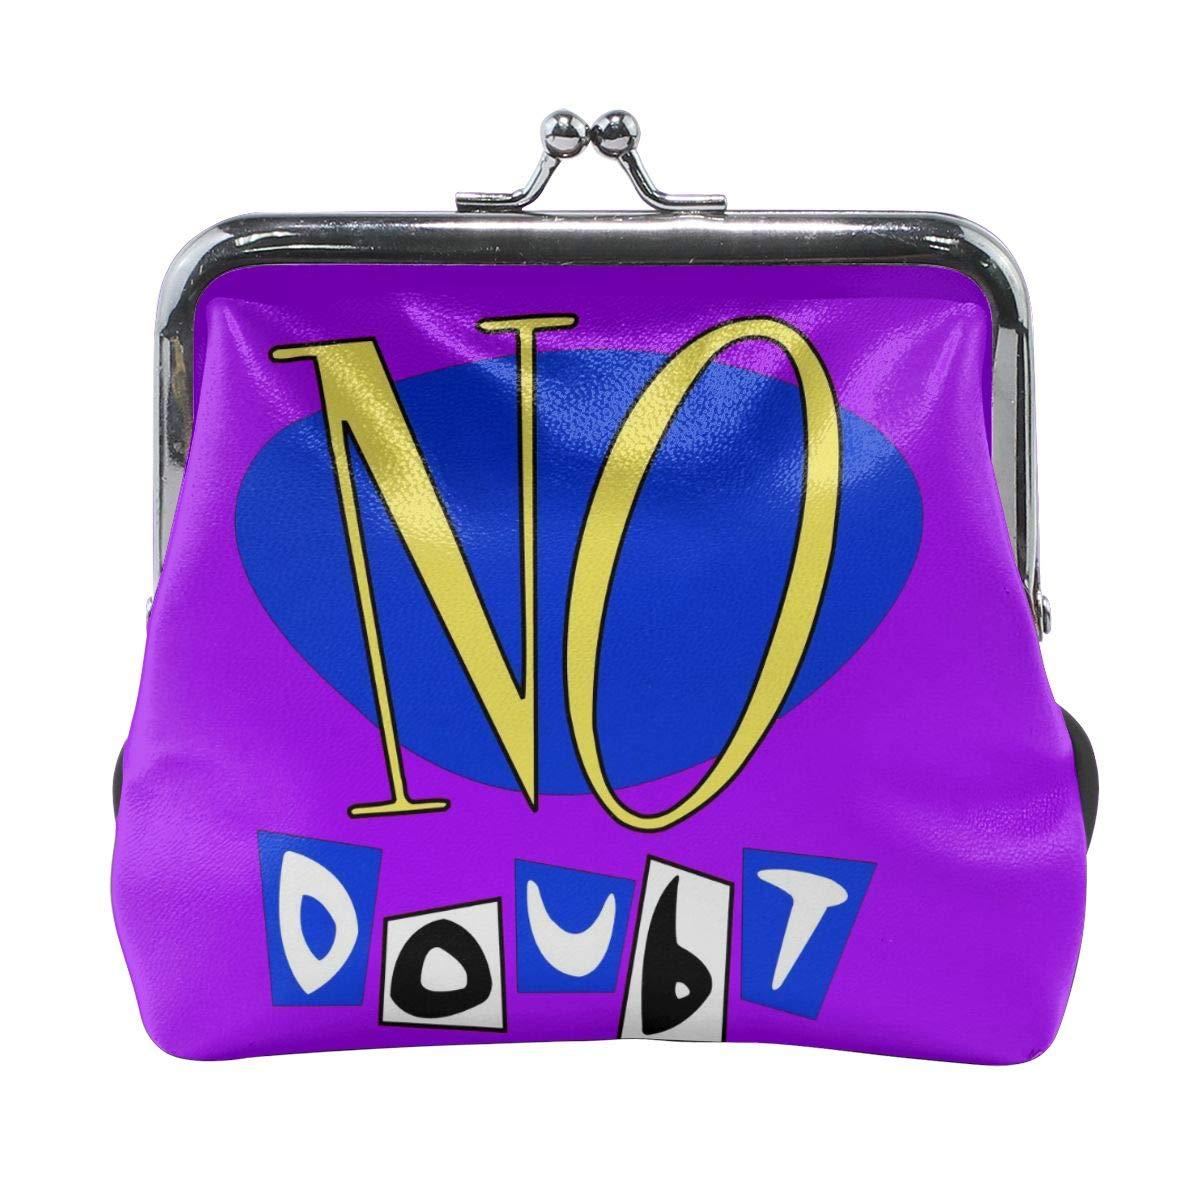 No Doubt Coin Purse Pouch Kiss-lock Change Purse Wallets